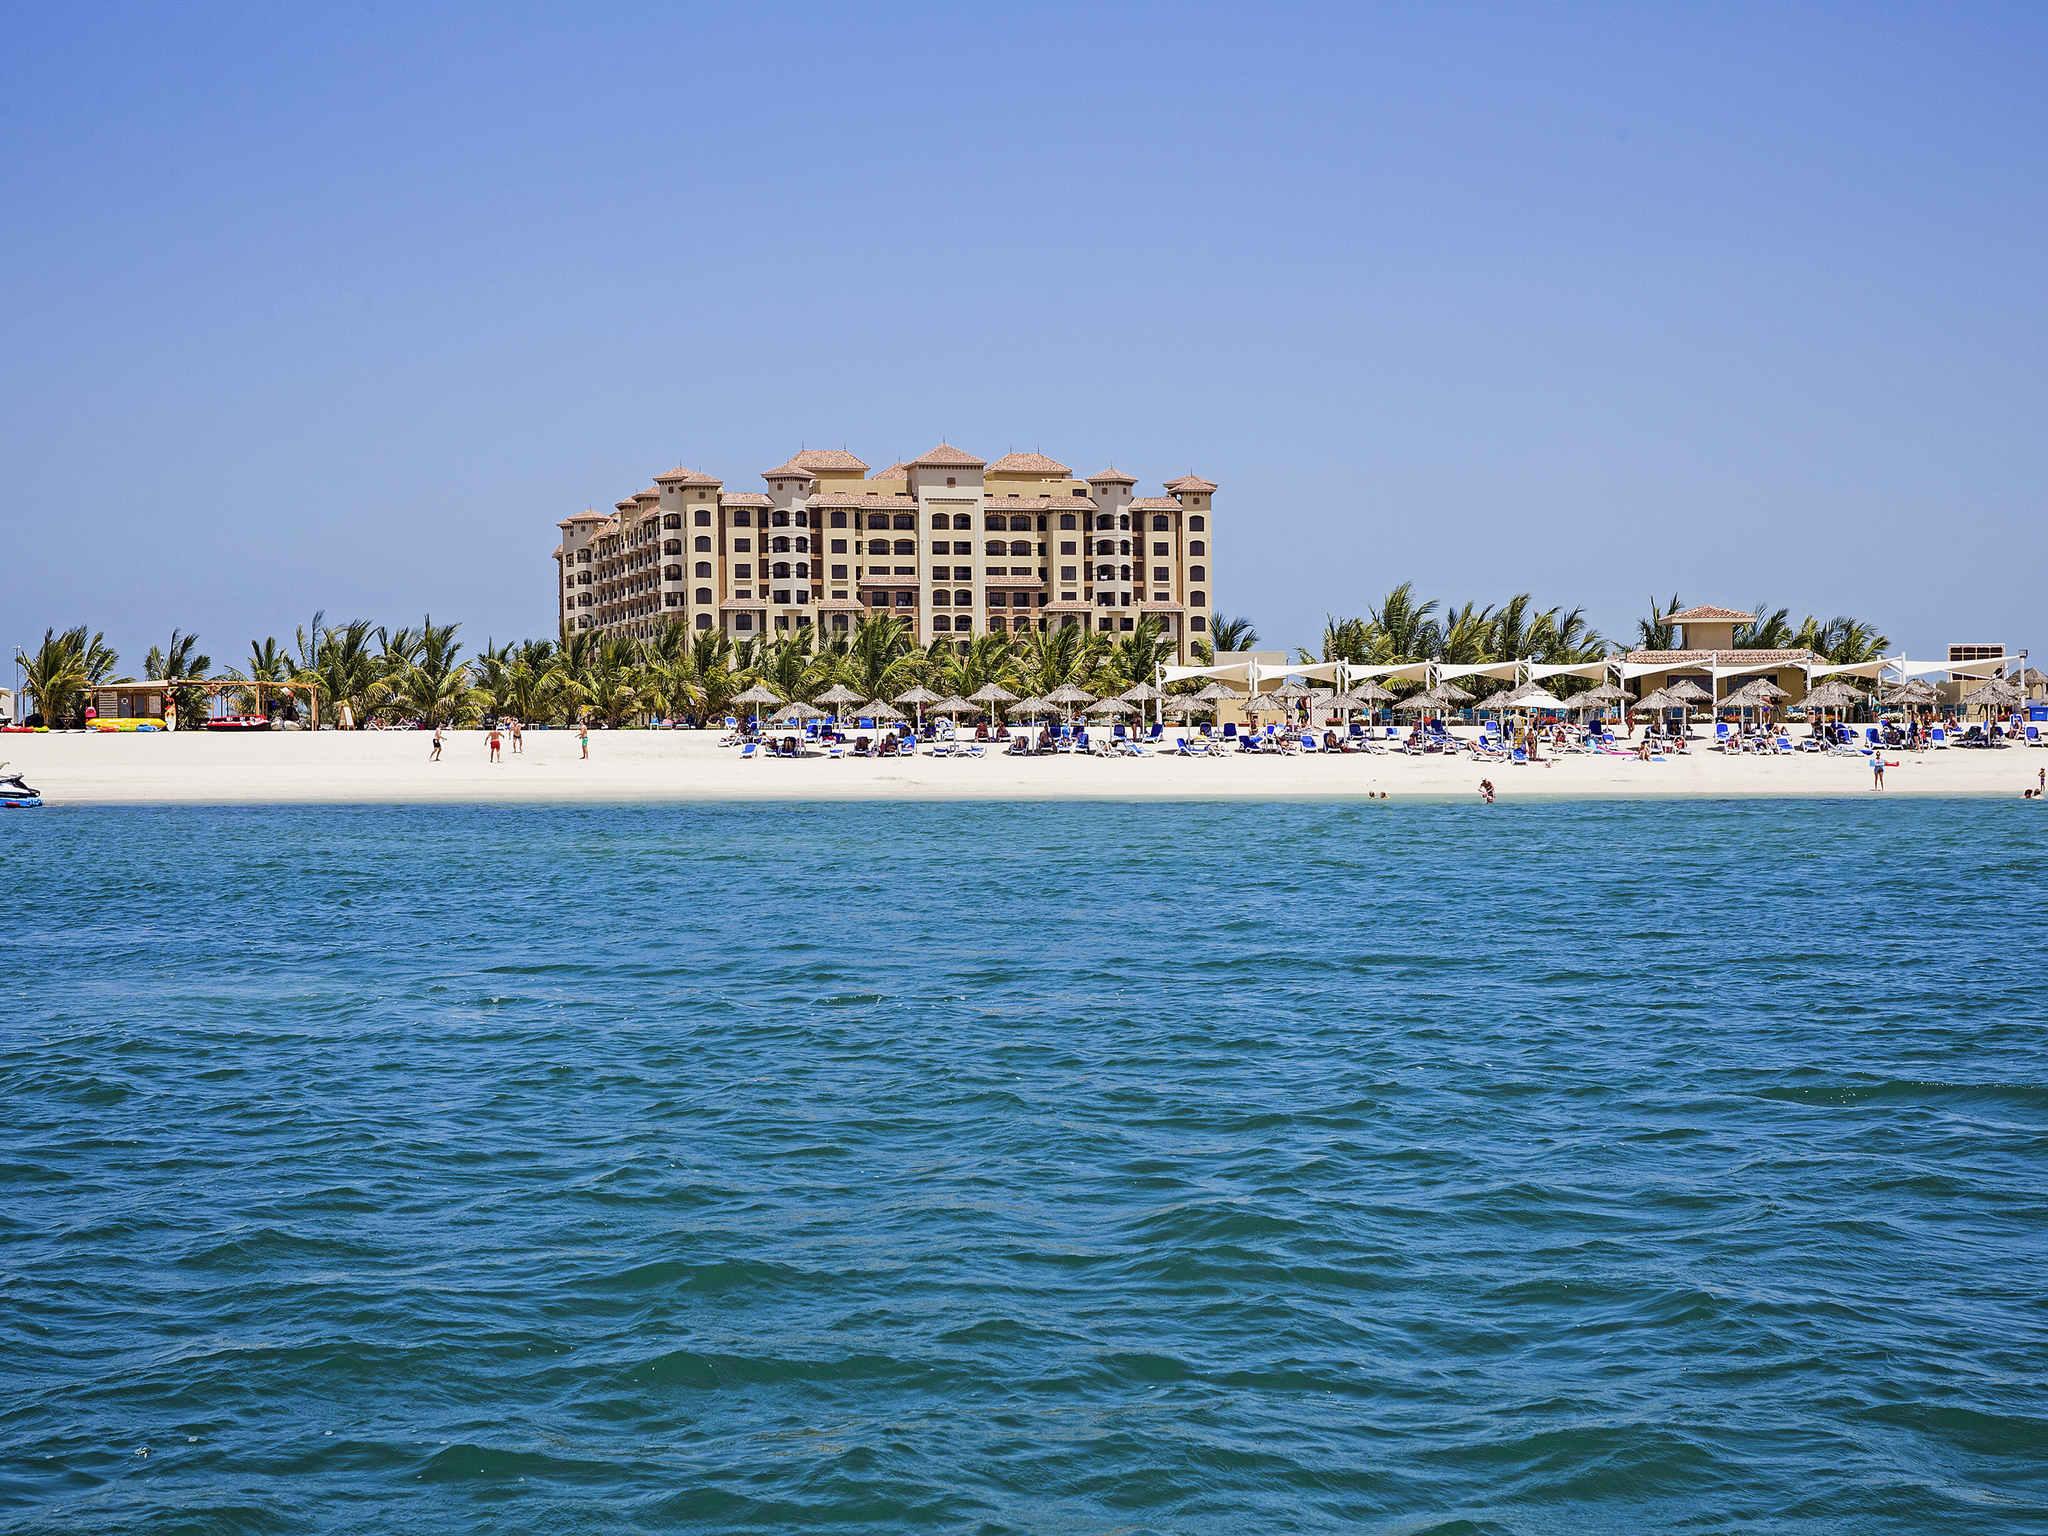 Otel – AccorHotels Yönetiminde Marjan Island Resort & Spa